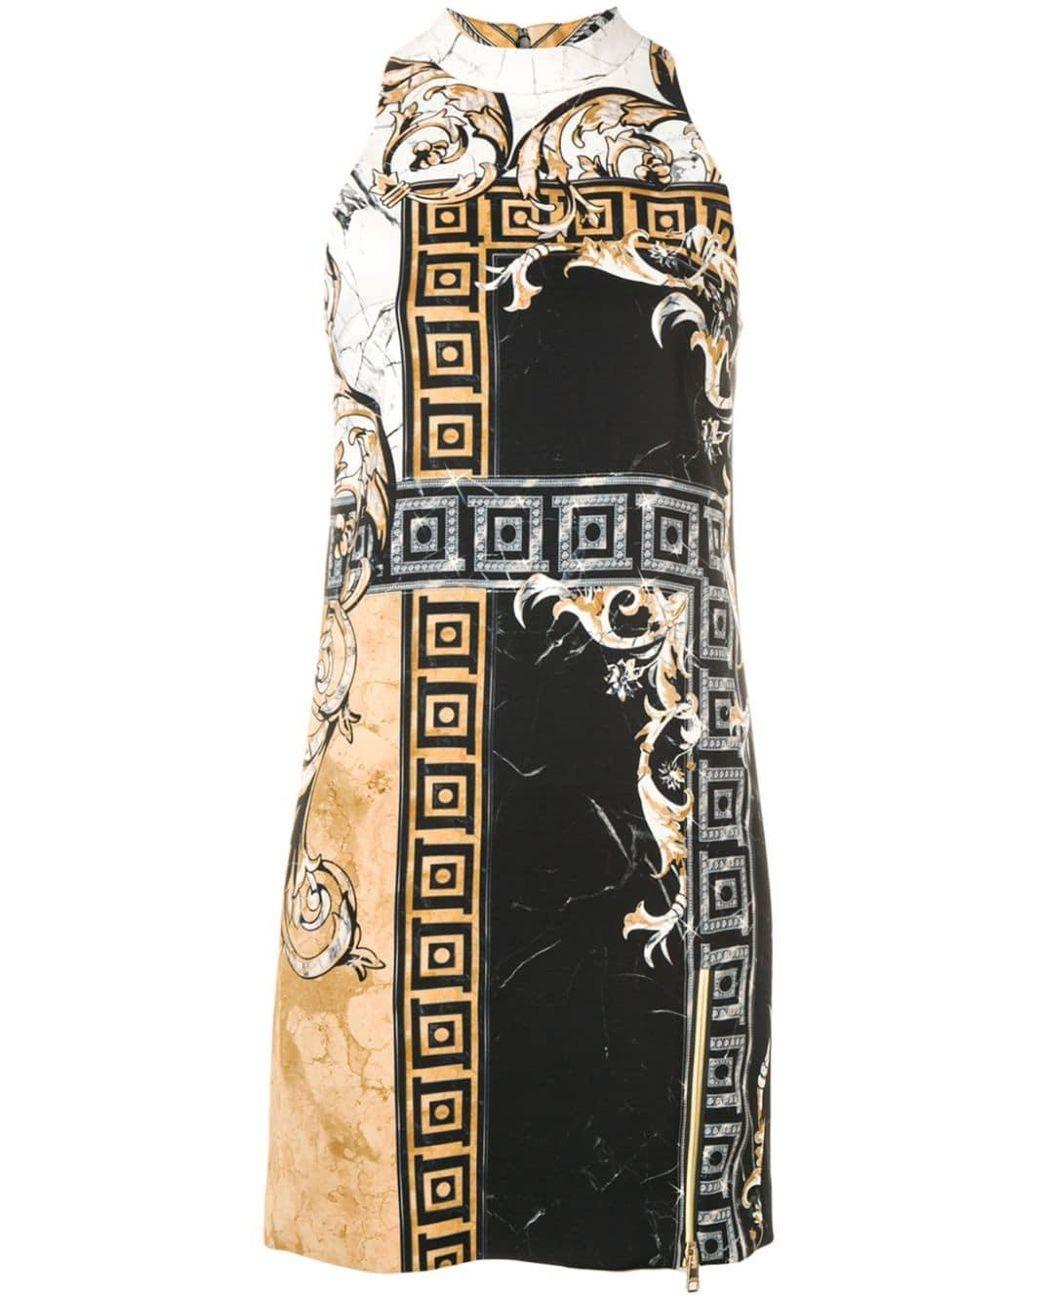 ef63ea1eaba4 Versace Marble Baroque Print Dress in Black - Save 70% - Lyst